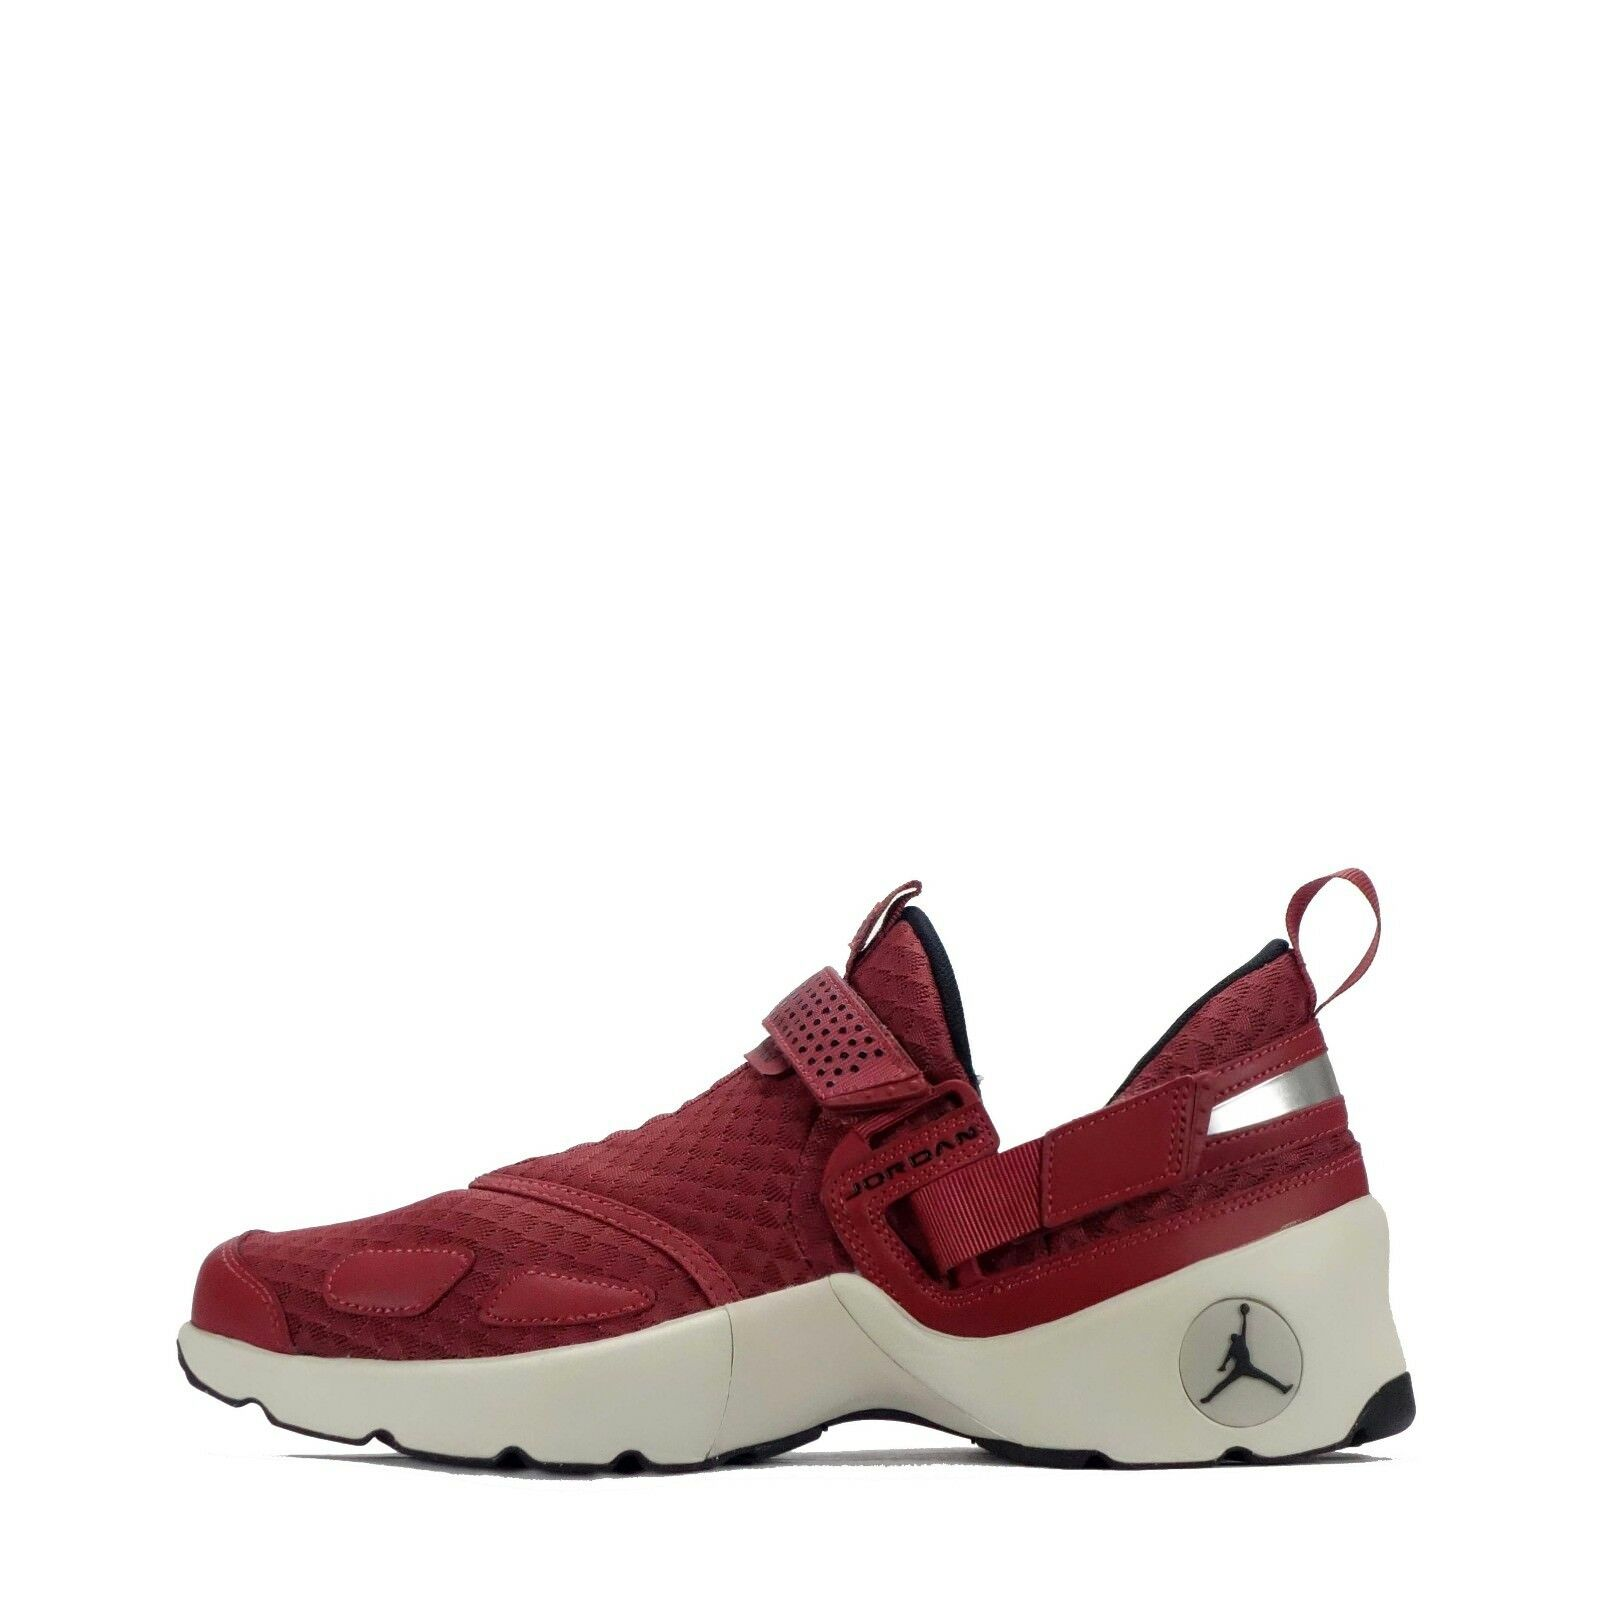 Jordan Trunner LX Casual Low Top Slip on Style Men's Schuhes in Cedar/schwarz